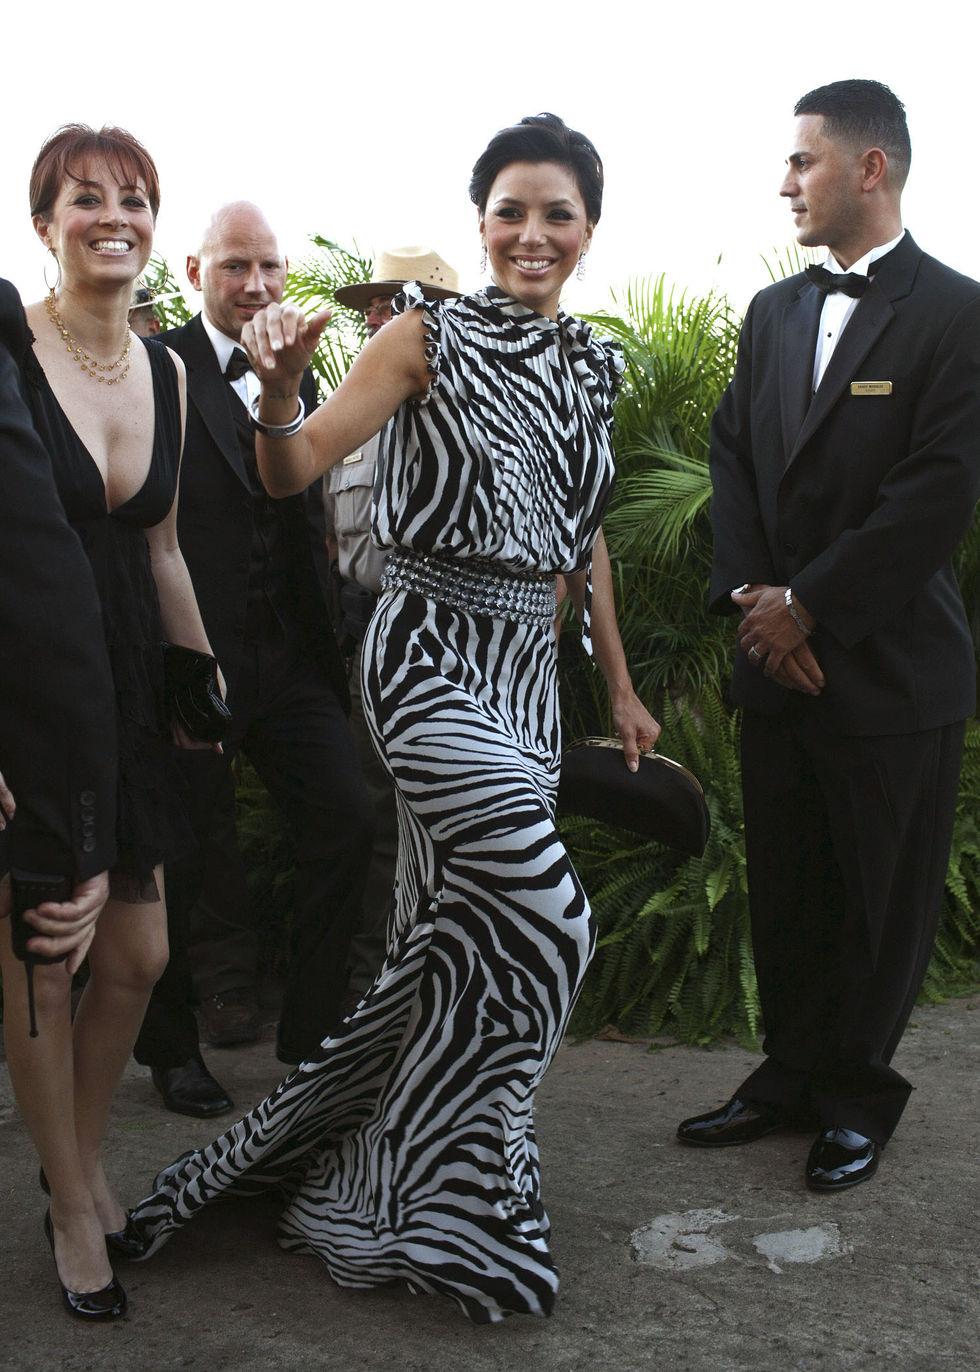 eva-longoria-arrives-at-the-wedding-of-roselyn-sanchez-in-puerto-rico-01